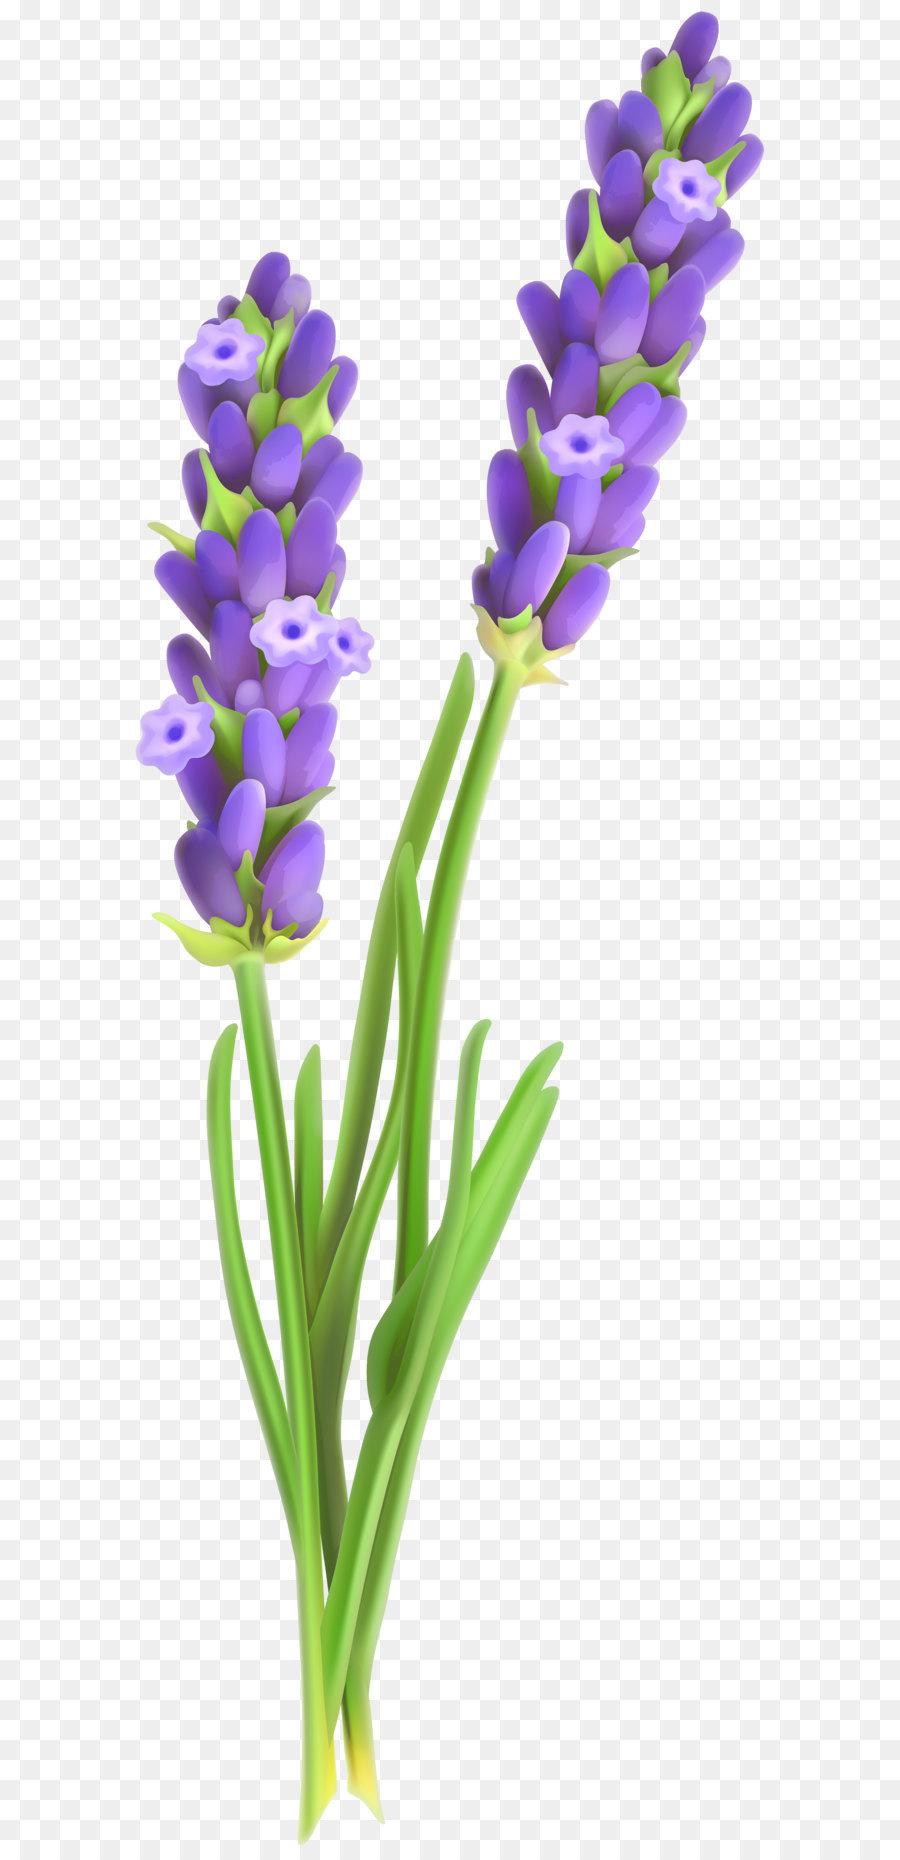 Lavender clipart lavender plant. Flower png download free